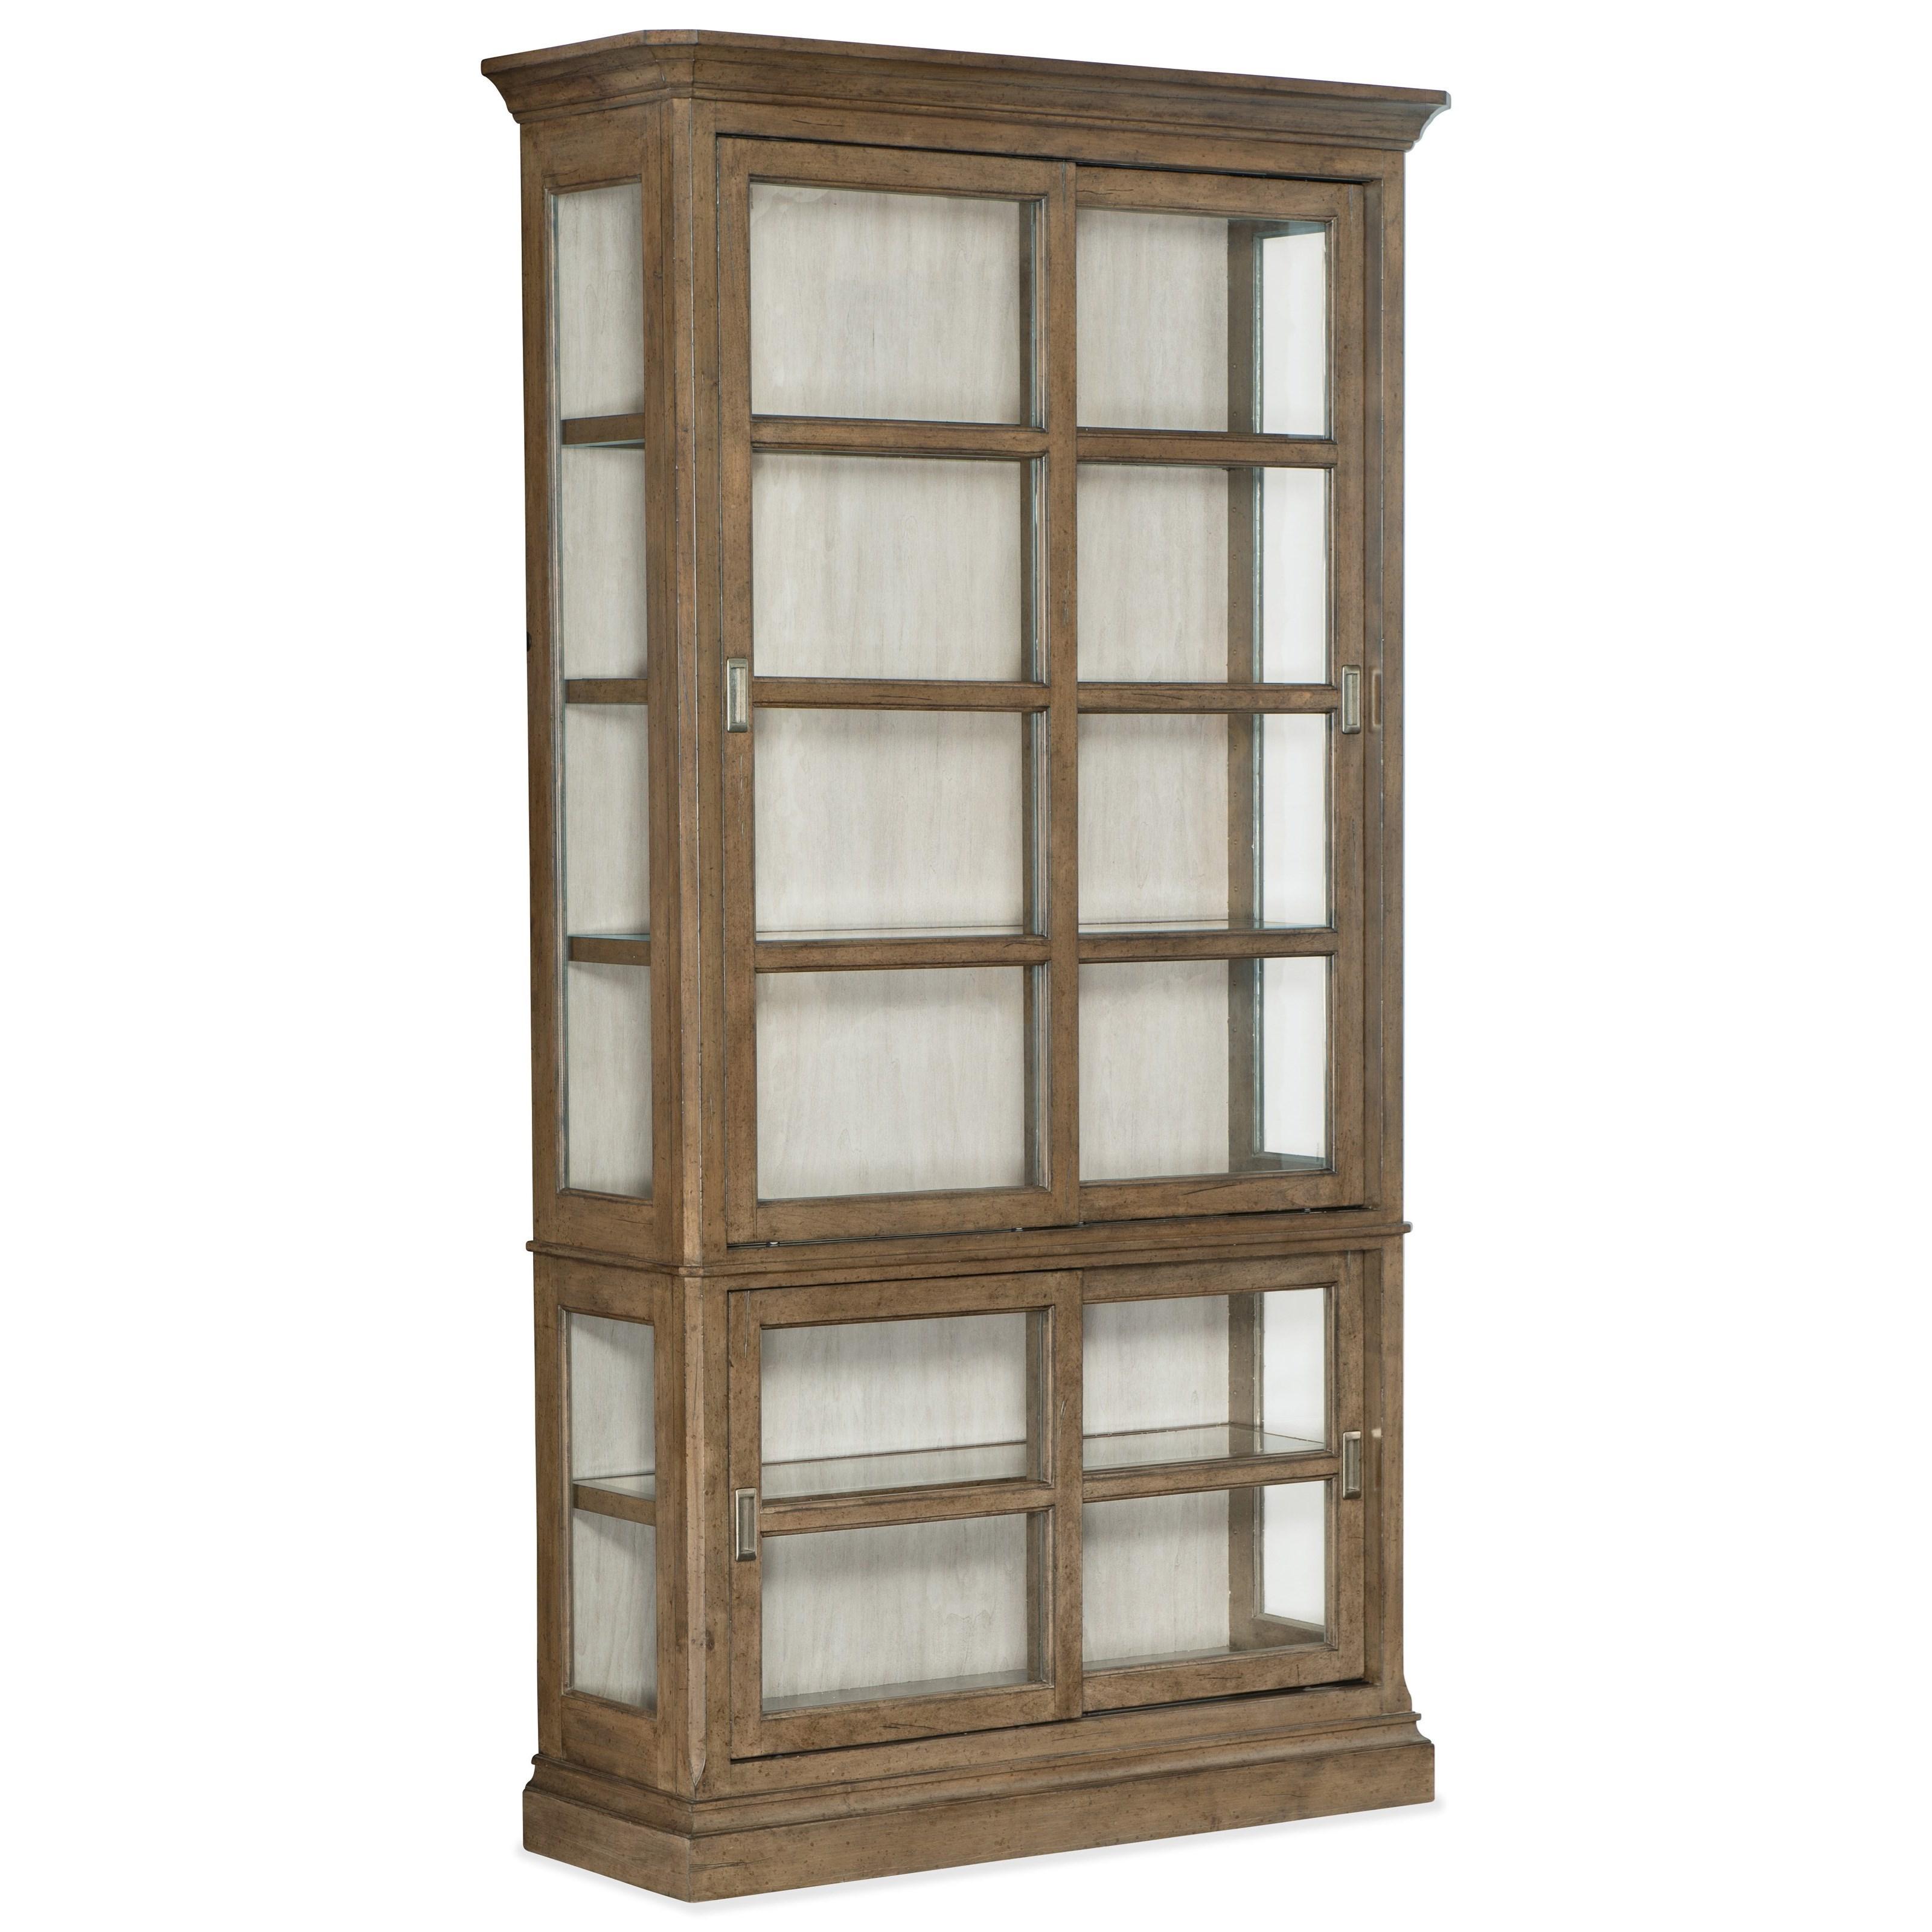 Montebello Sliding Door Display Cabinet by Hooker Furniture at Stoney Creek Furniture